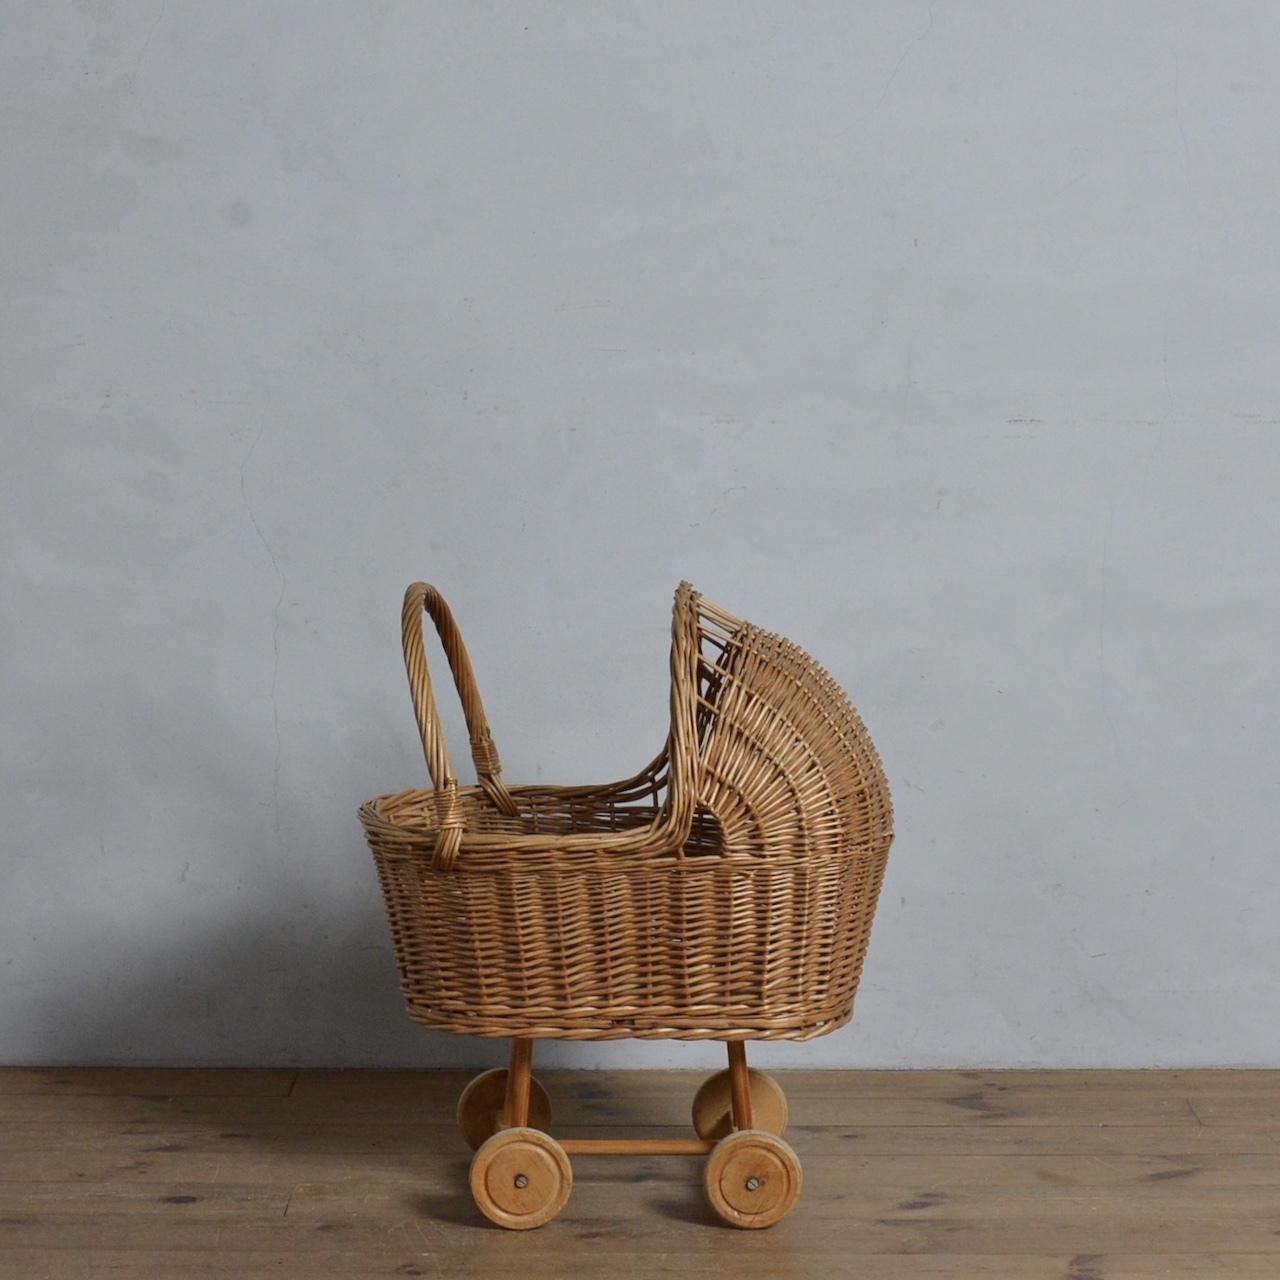 Rattan Baby Walker  / ラタン ベビー ウォーカー〈ワゴン・収納・バスケット・店舗什器〉112204